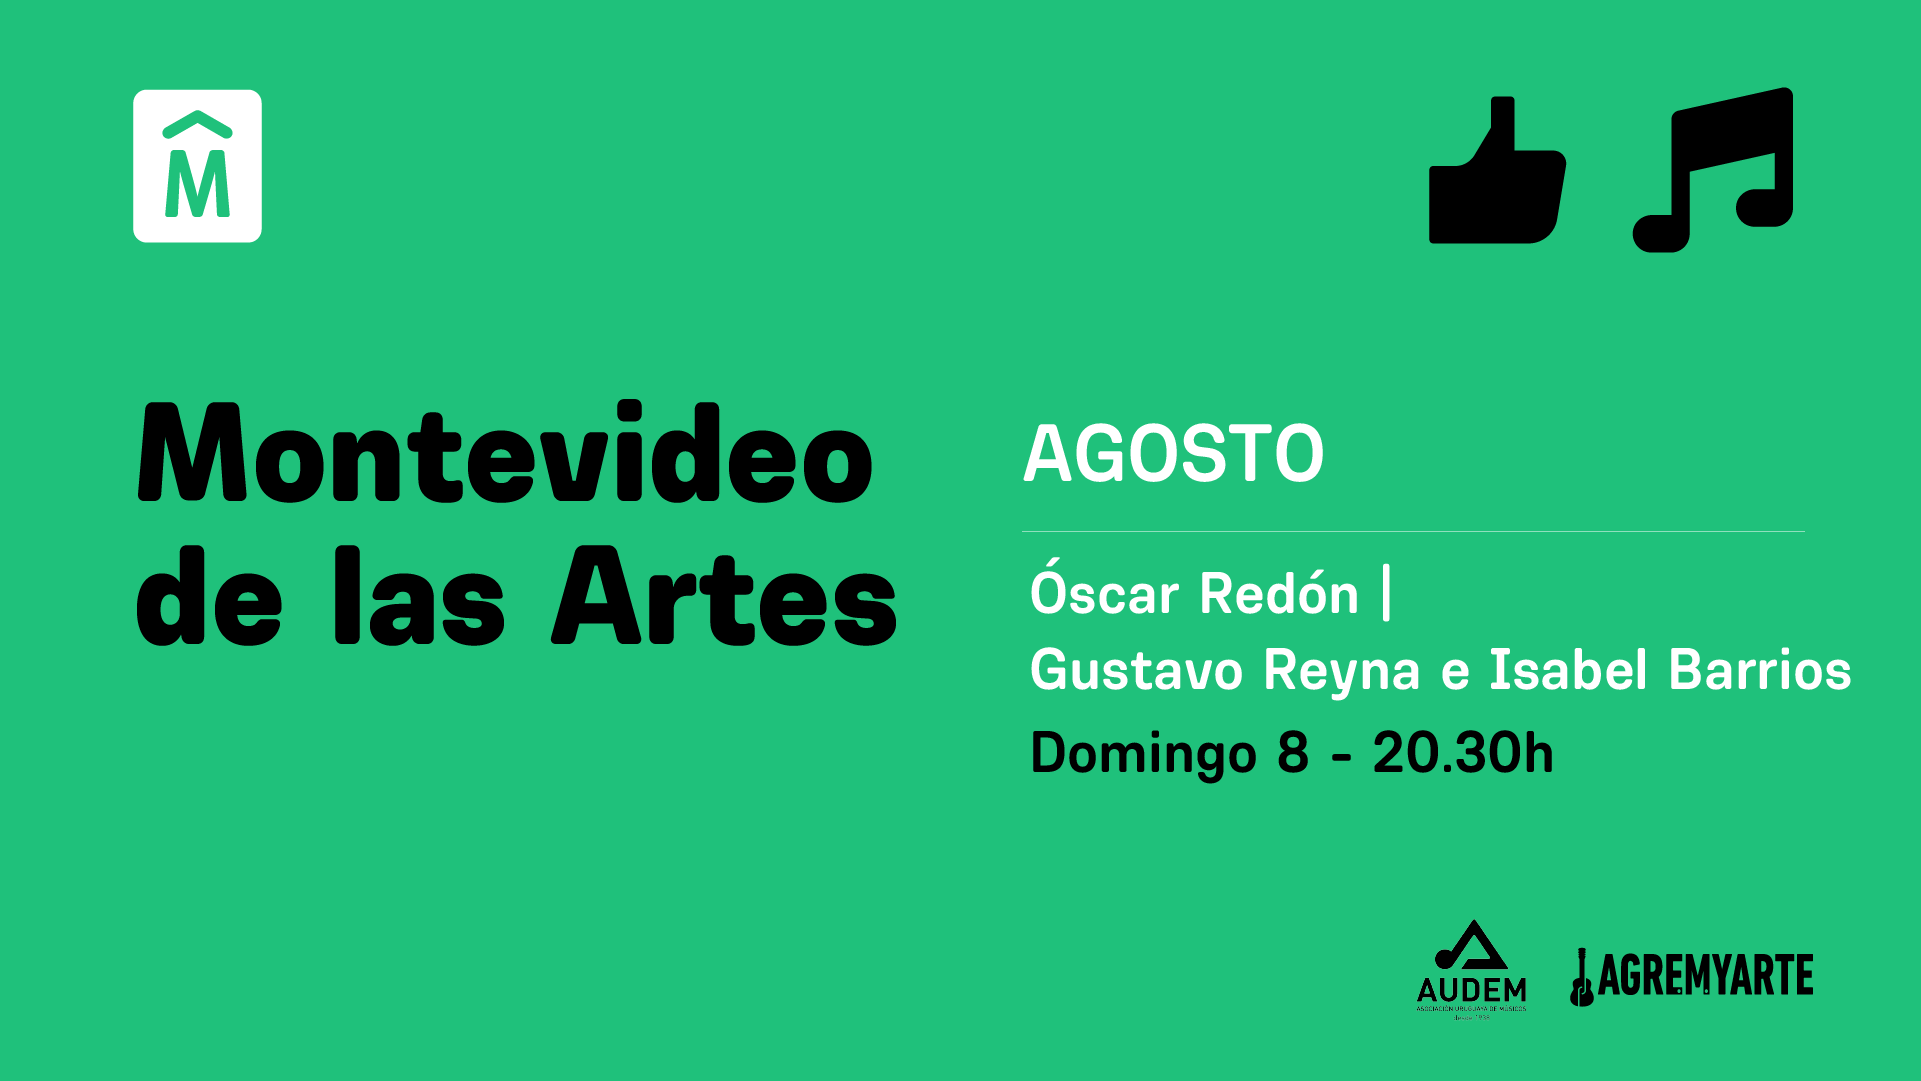 Oscar Redón, Reyna & Barrios – MVD de las Artes